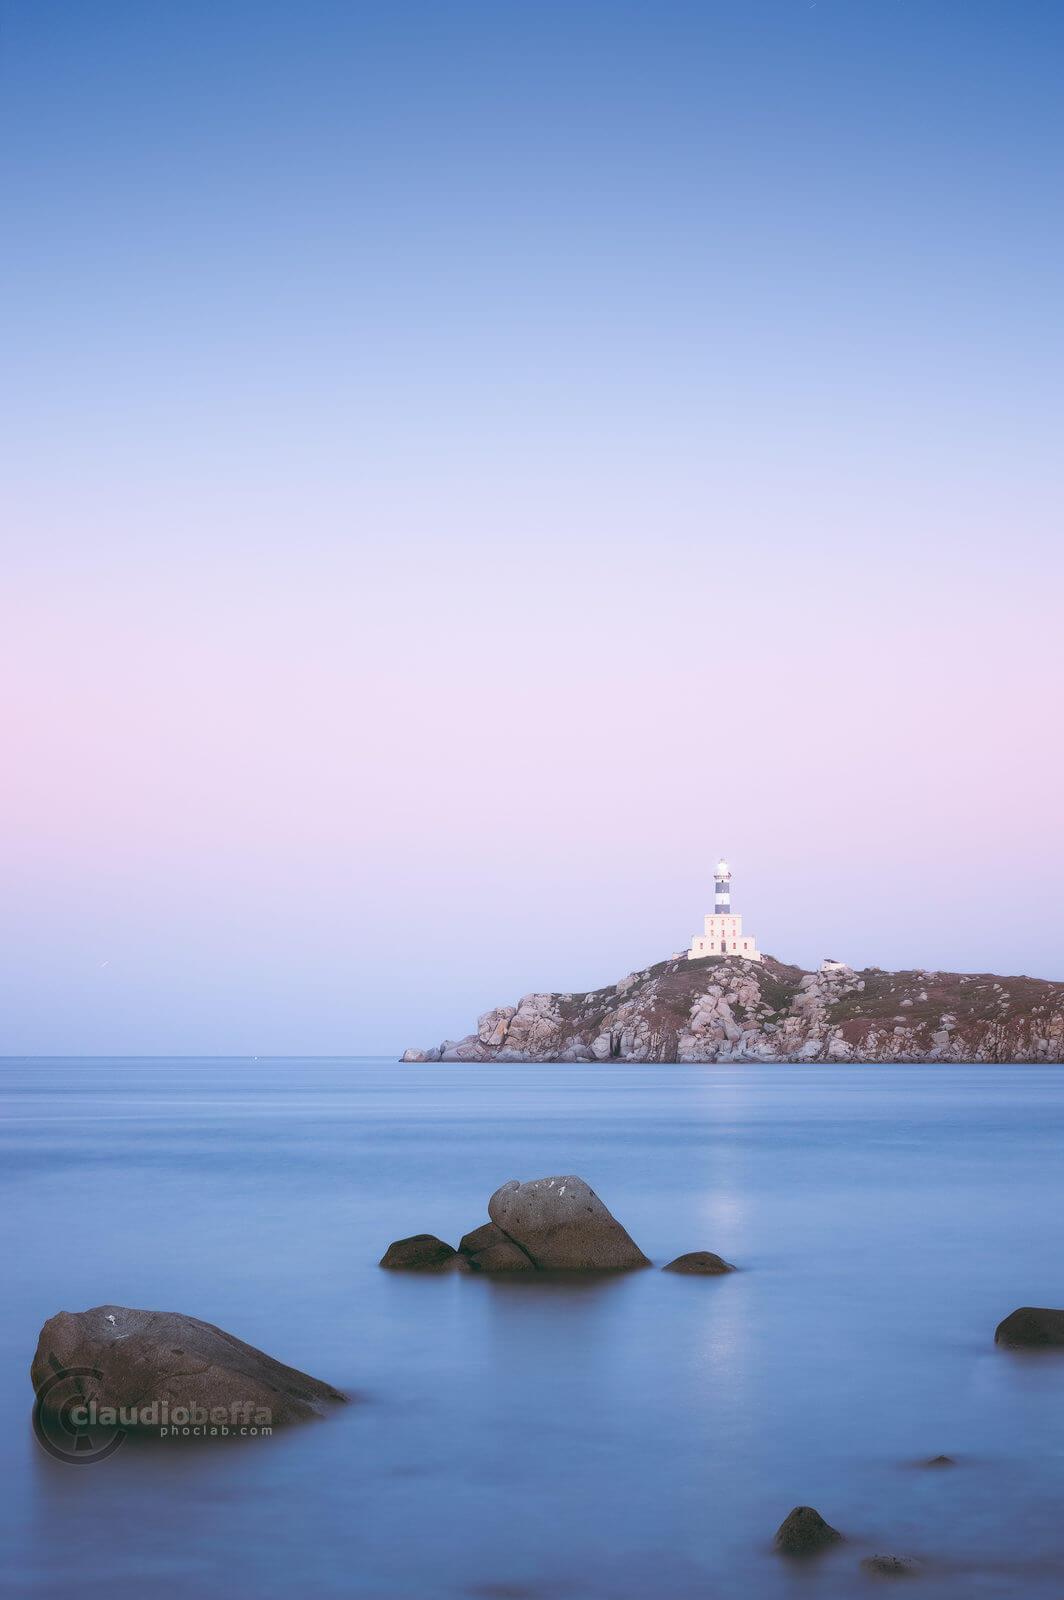 stillness, twilight, sea, sky, rocks, lighthouse, seascape, long exposure